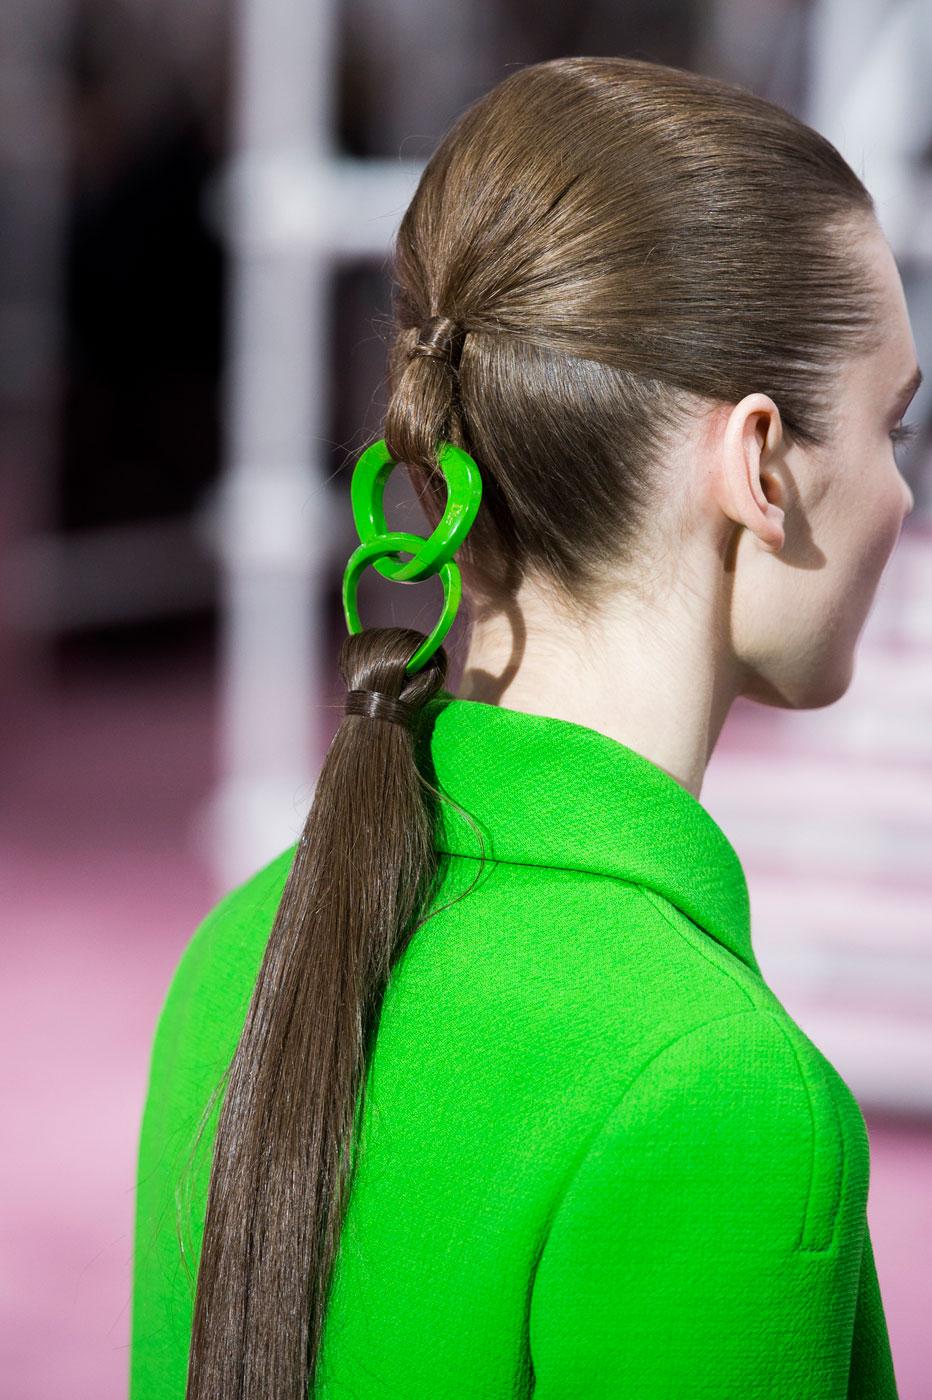 Christian-Dior-fashion-runway-show-close-ups-haute-couture-paris-spring-summer-2015-the-impression-187